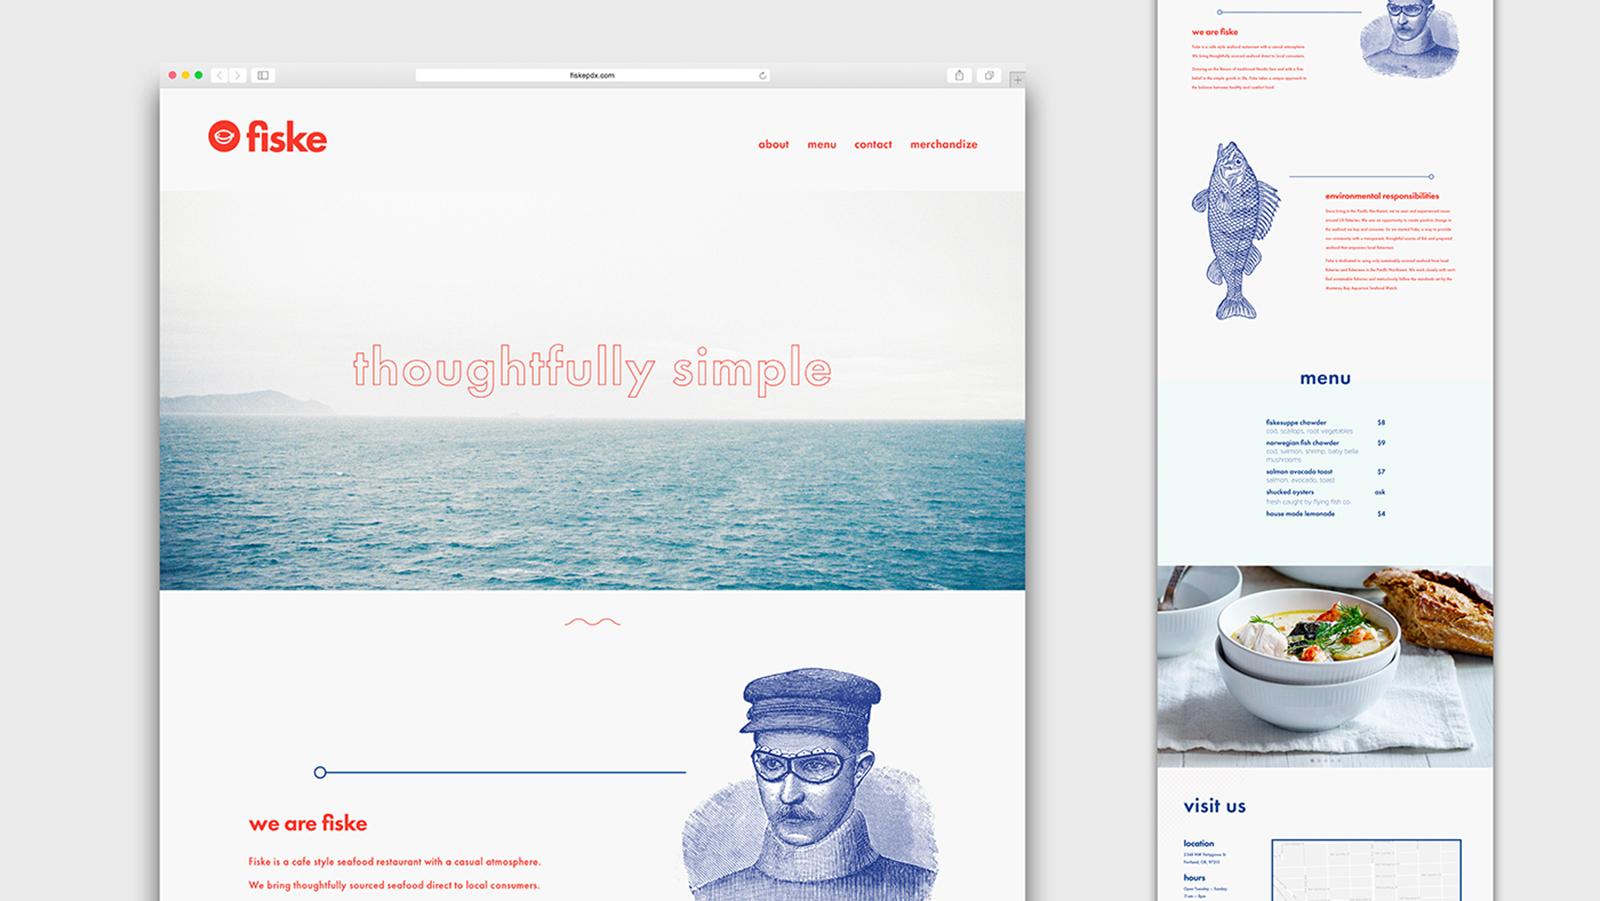 Fiske海鲜餐厅品牌视觉VI形象设计整理欣赏-VI设计2